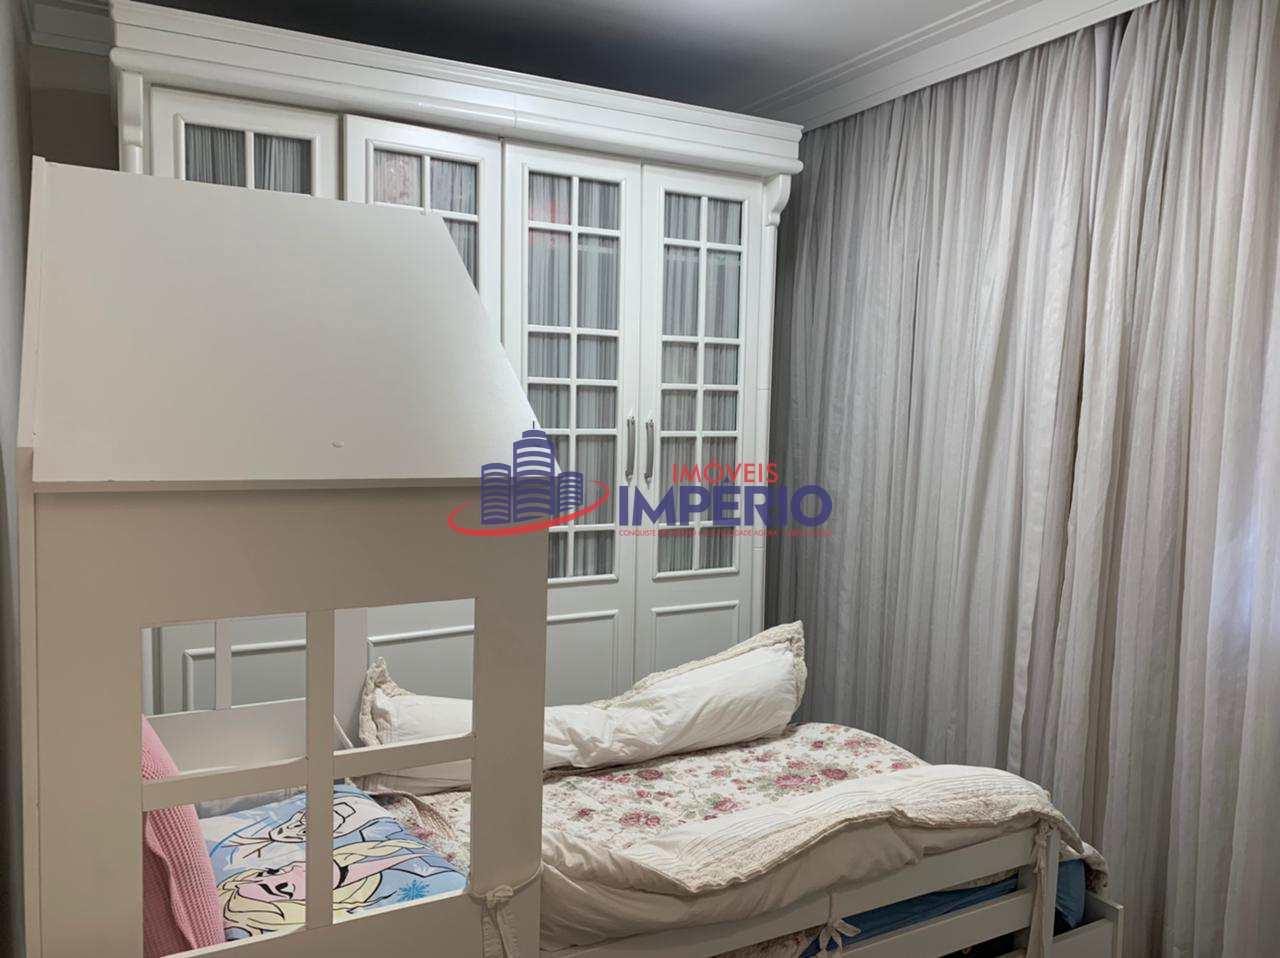 Apartamento com 3 dorms, Vila Leonor, Guarulhos - R$ 1.17 mi, Cod: 7633